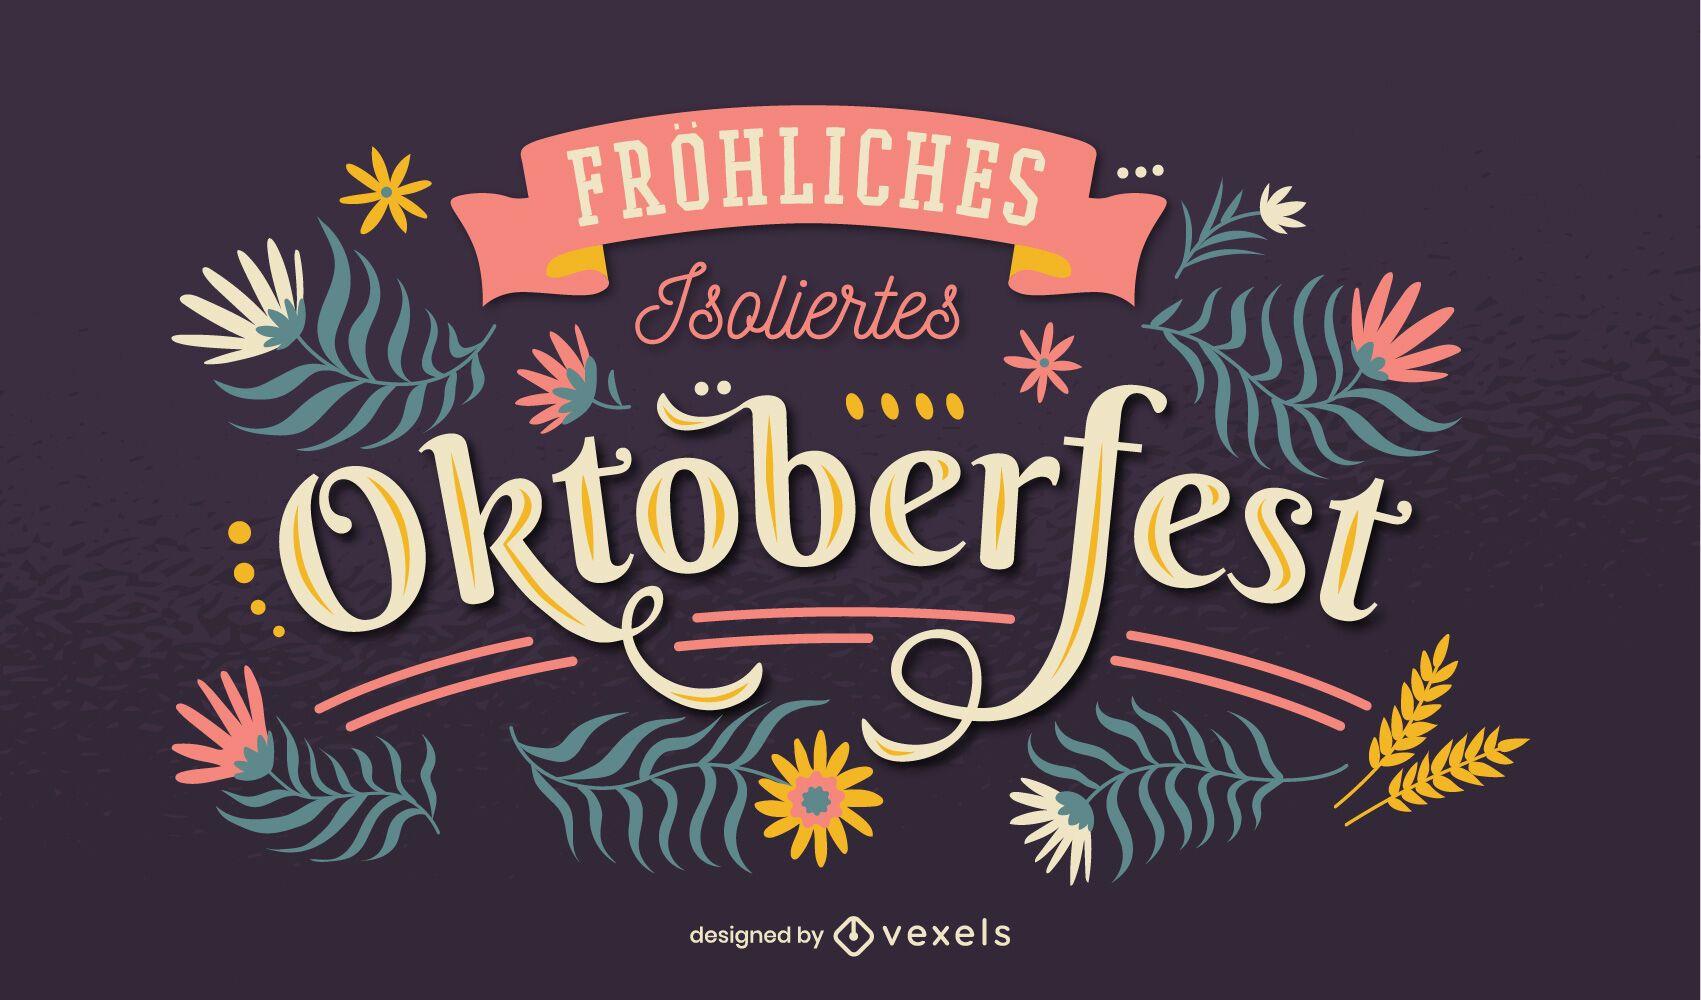 Letras cl?sicas de oktoberfest